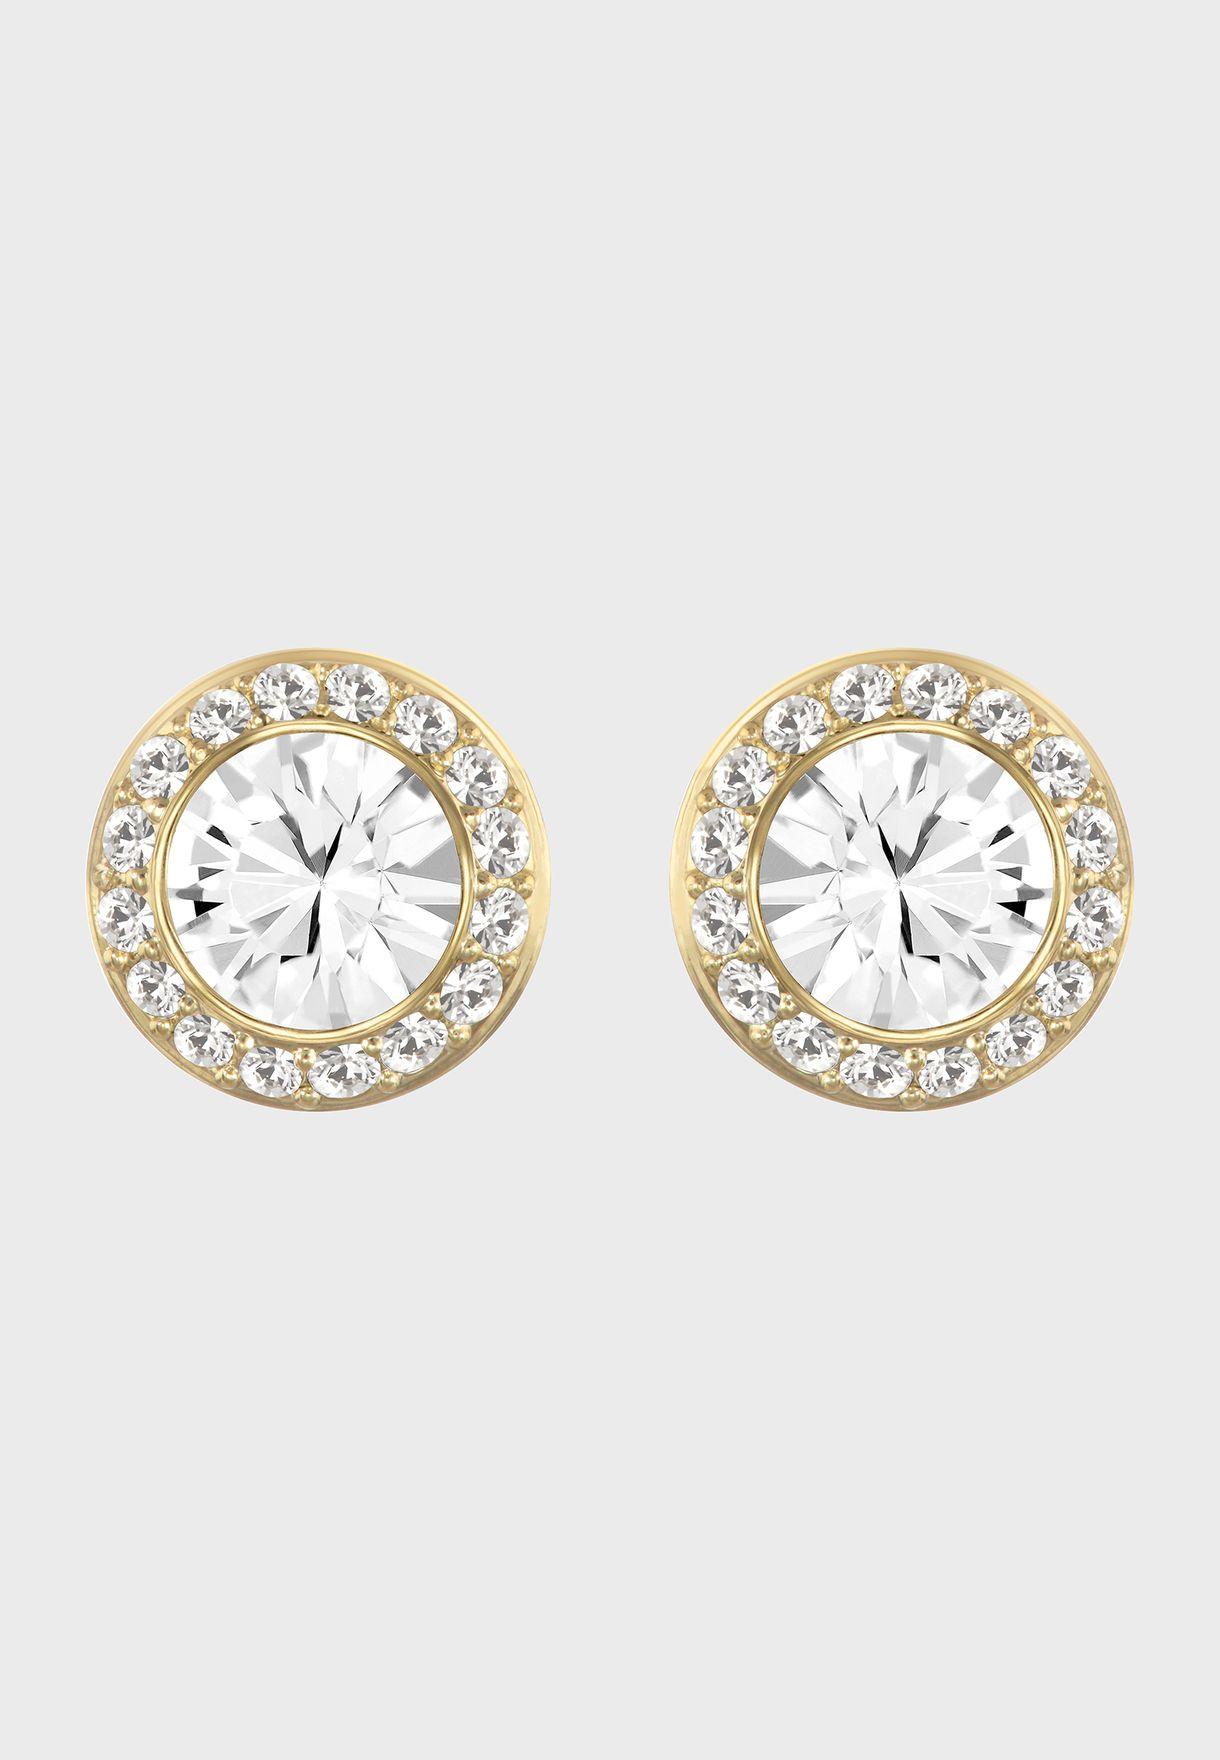 Angelic Round Stud Earrings